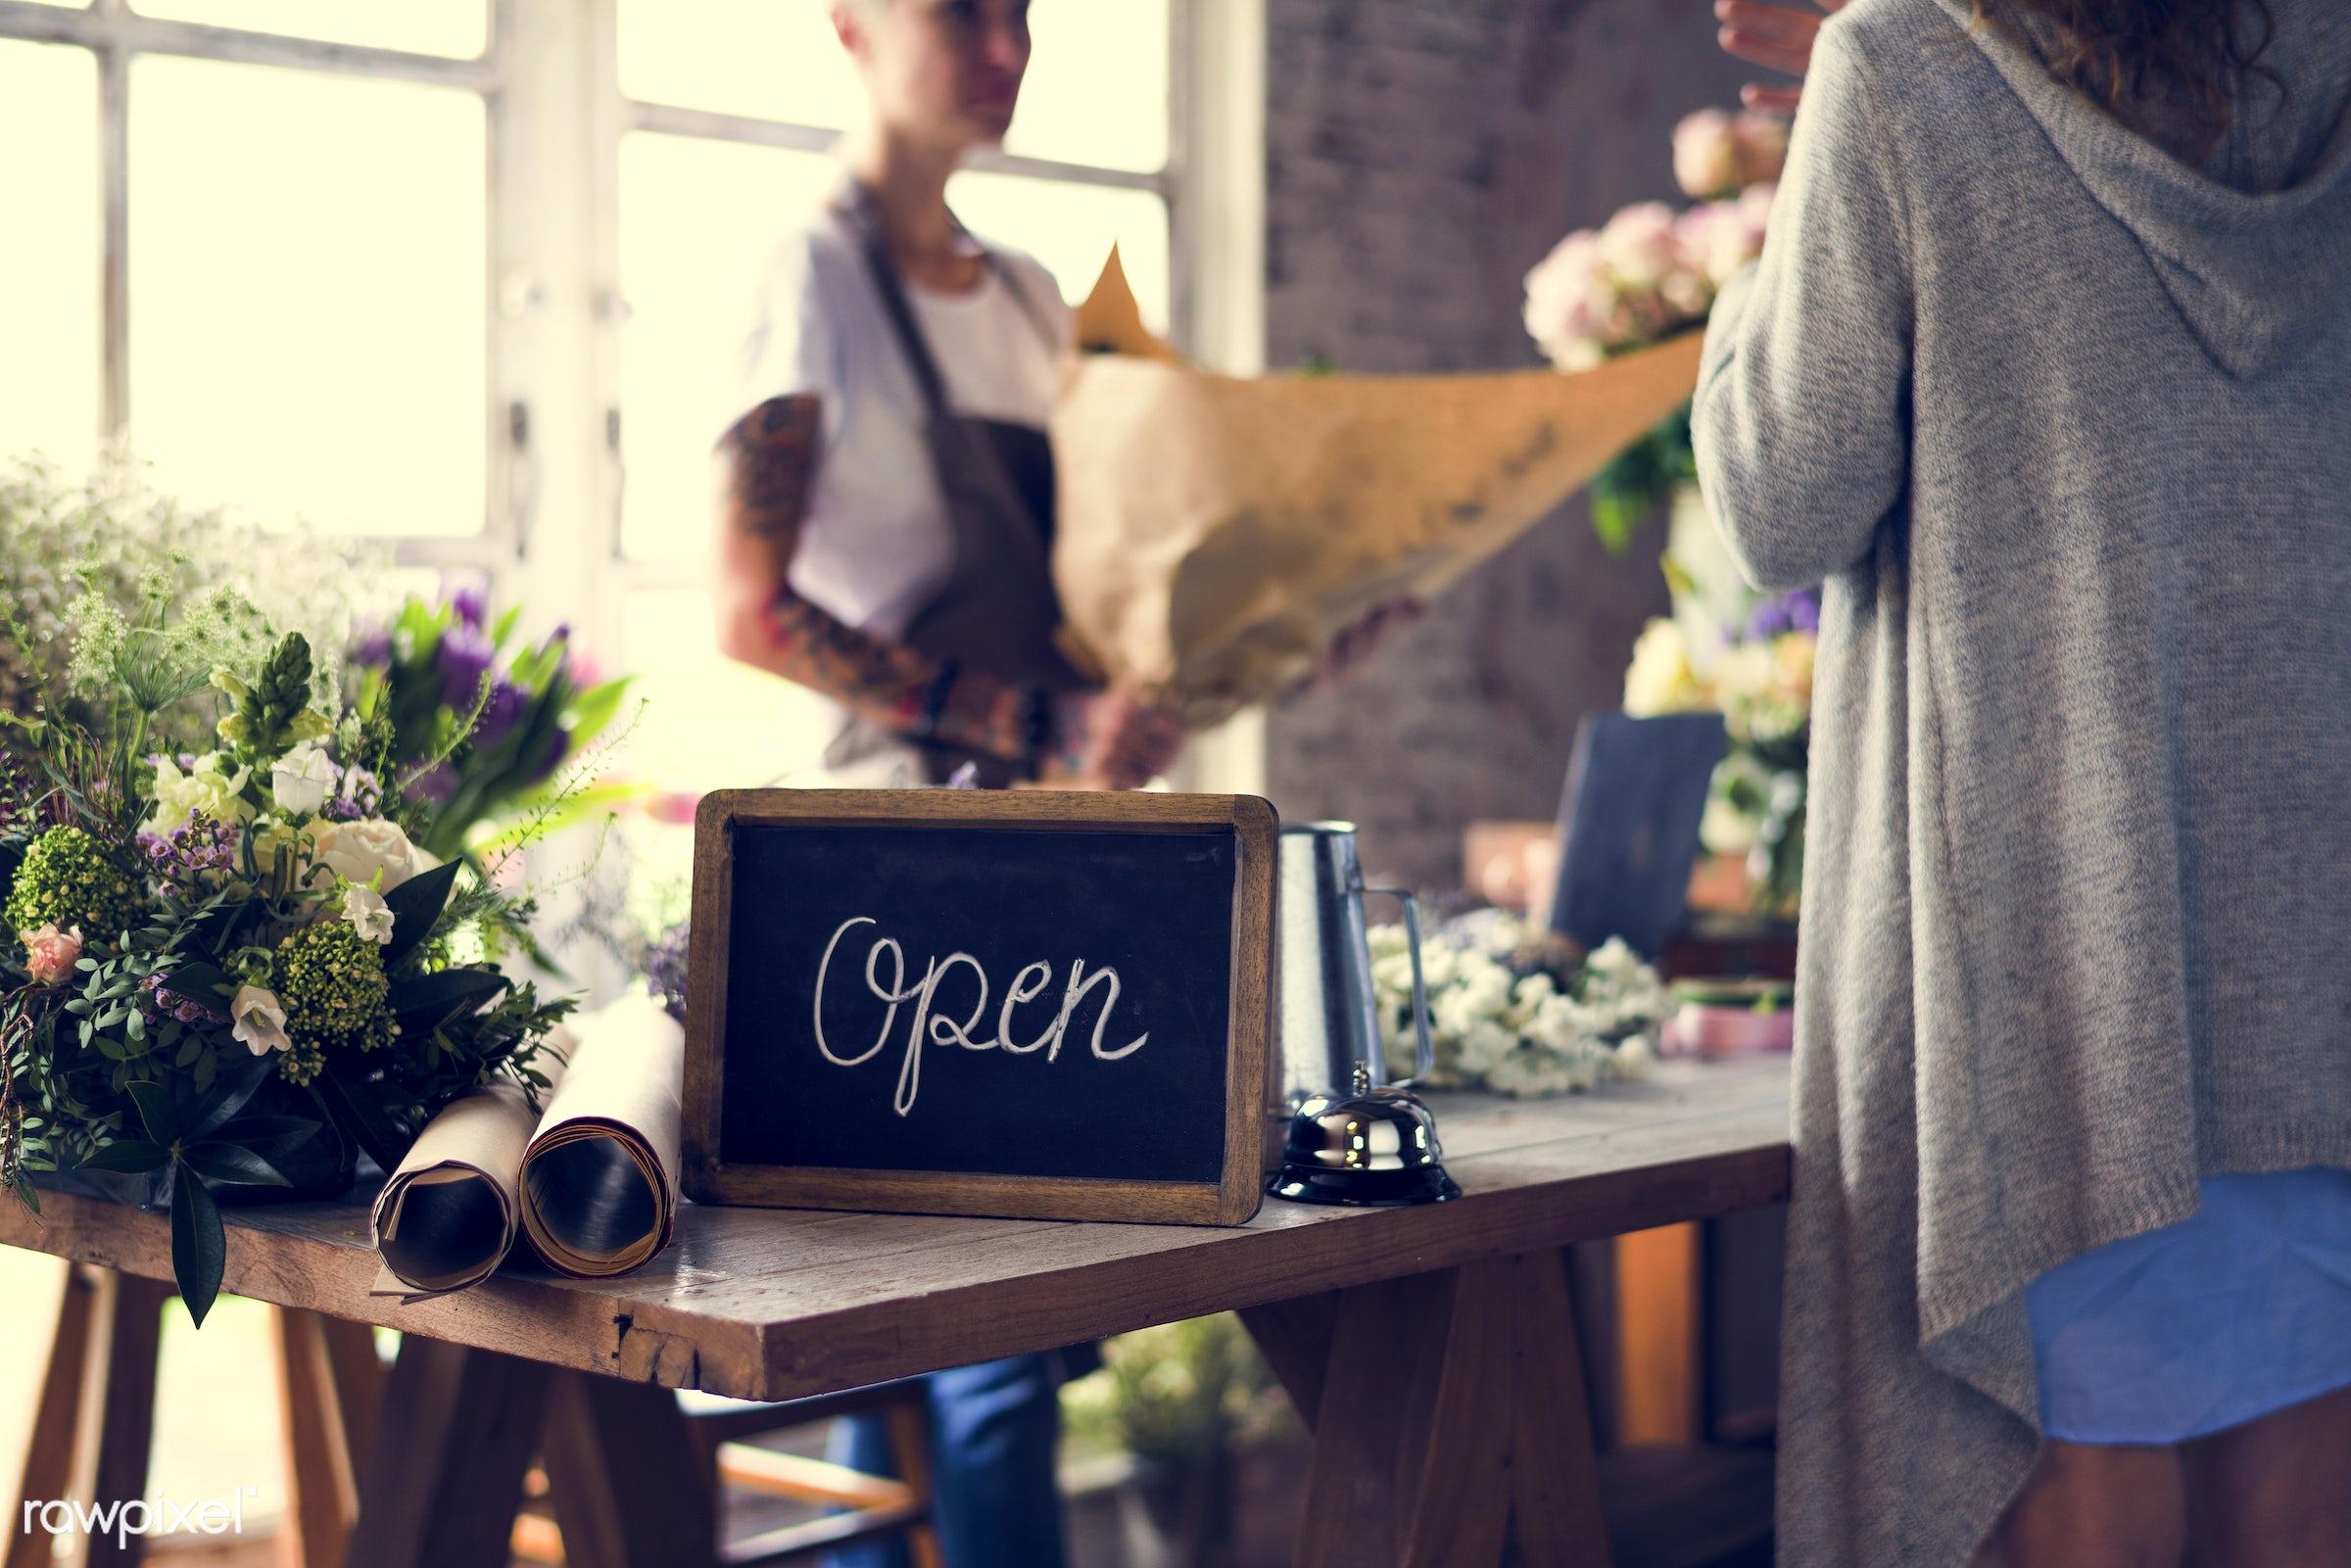 bouquet, shop, detail, person, customer, people, decor, nature, woman, tattoo, flowers, work, refreshment, florist, present...